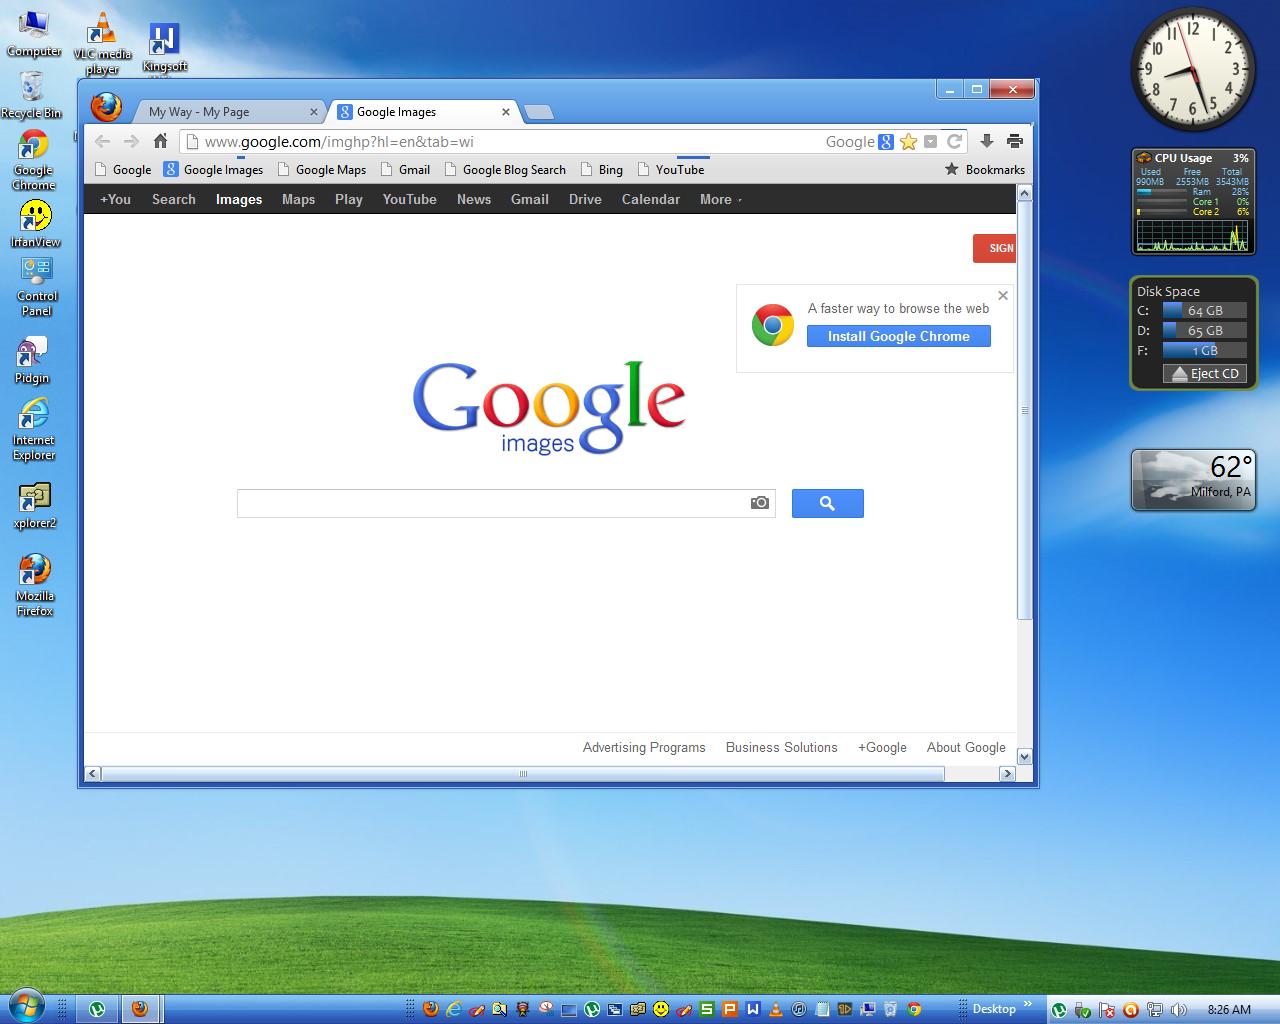 Google themes windows 10 - Below Is The Kingsoft Office 2013 Spreadsheet